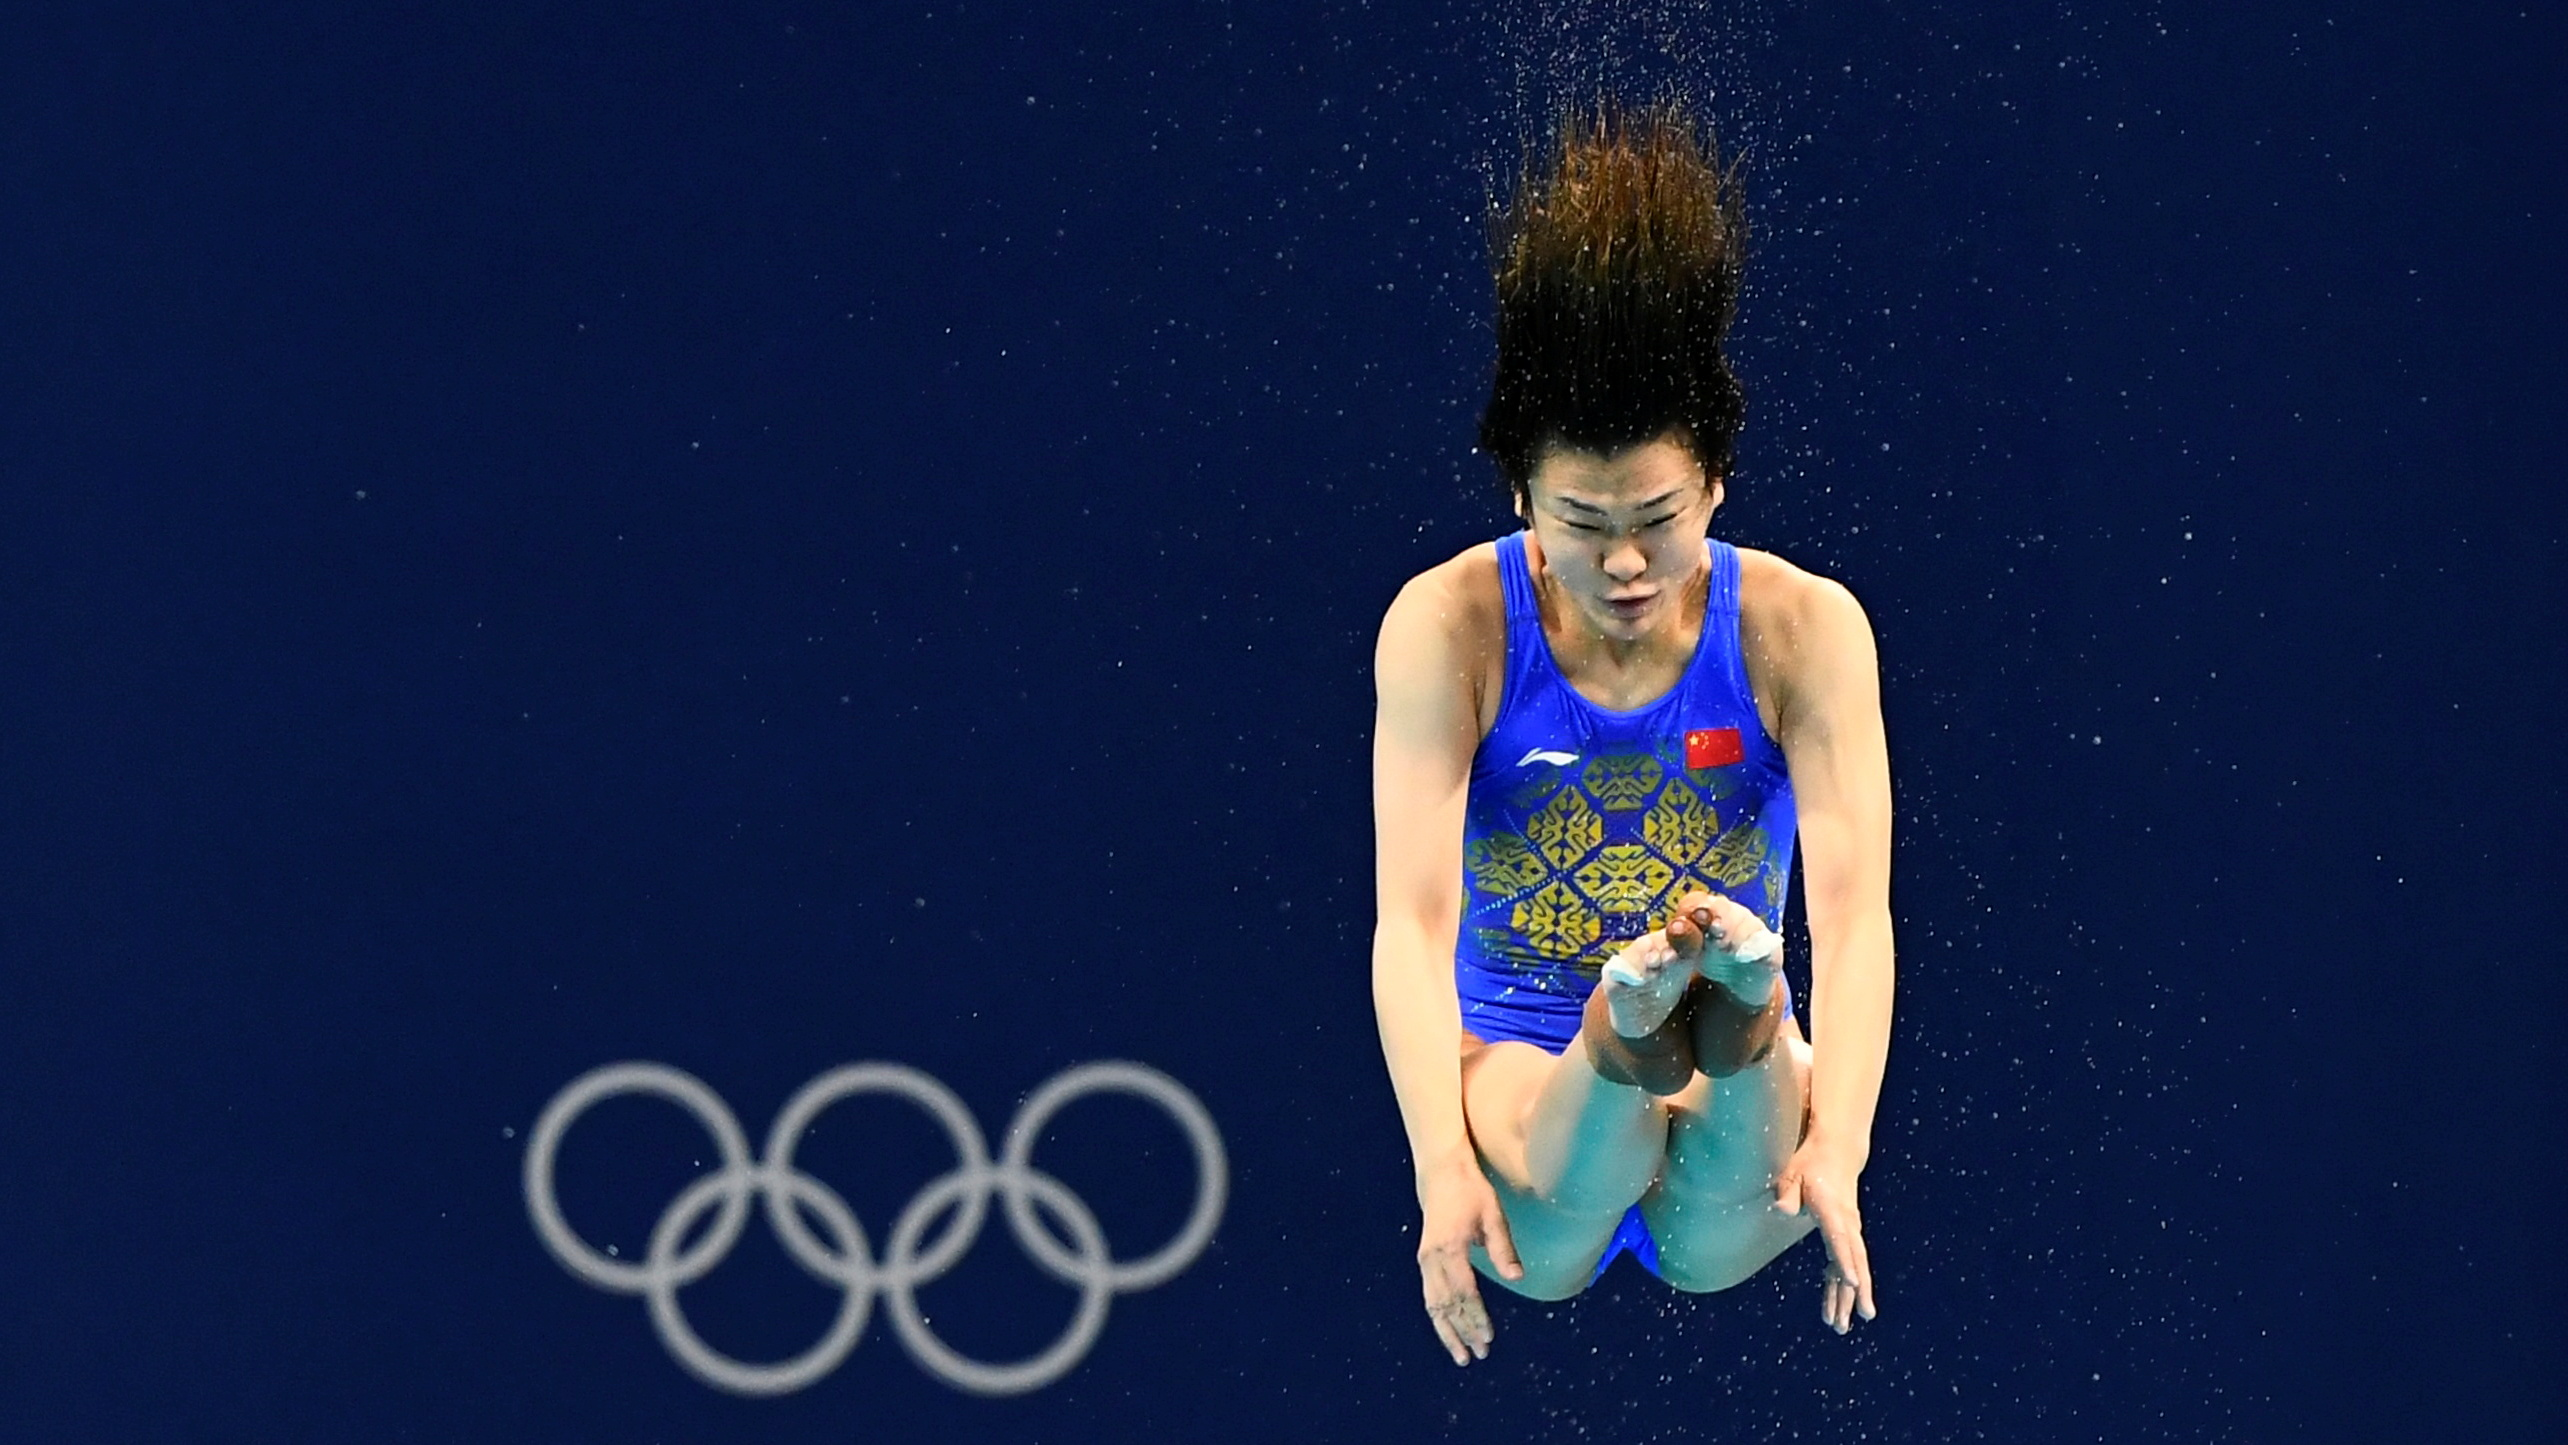 Tokyo 2020 Olympics - Diving - Women's 3m Springboard - Semifinal - Tokyo Aquatics Centre, Tokyo, Japan - July 31, 2021. Tingmao Shi of China in action REUTERS/Piroschka Van De Wouw